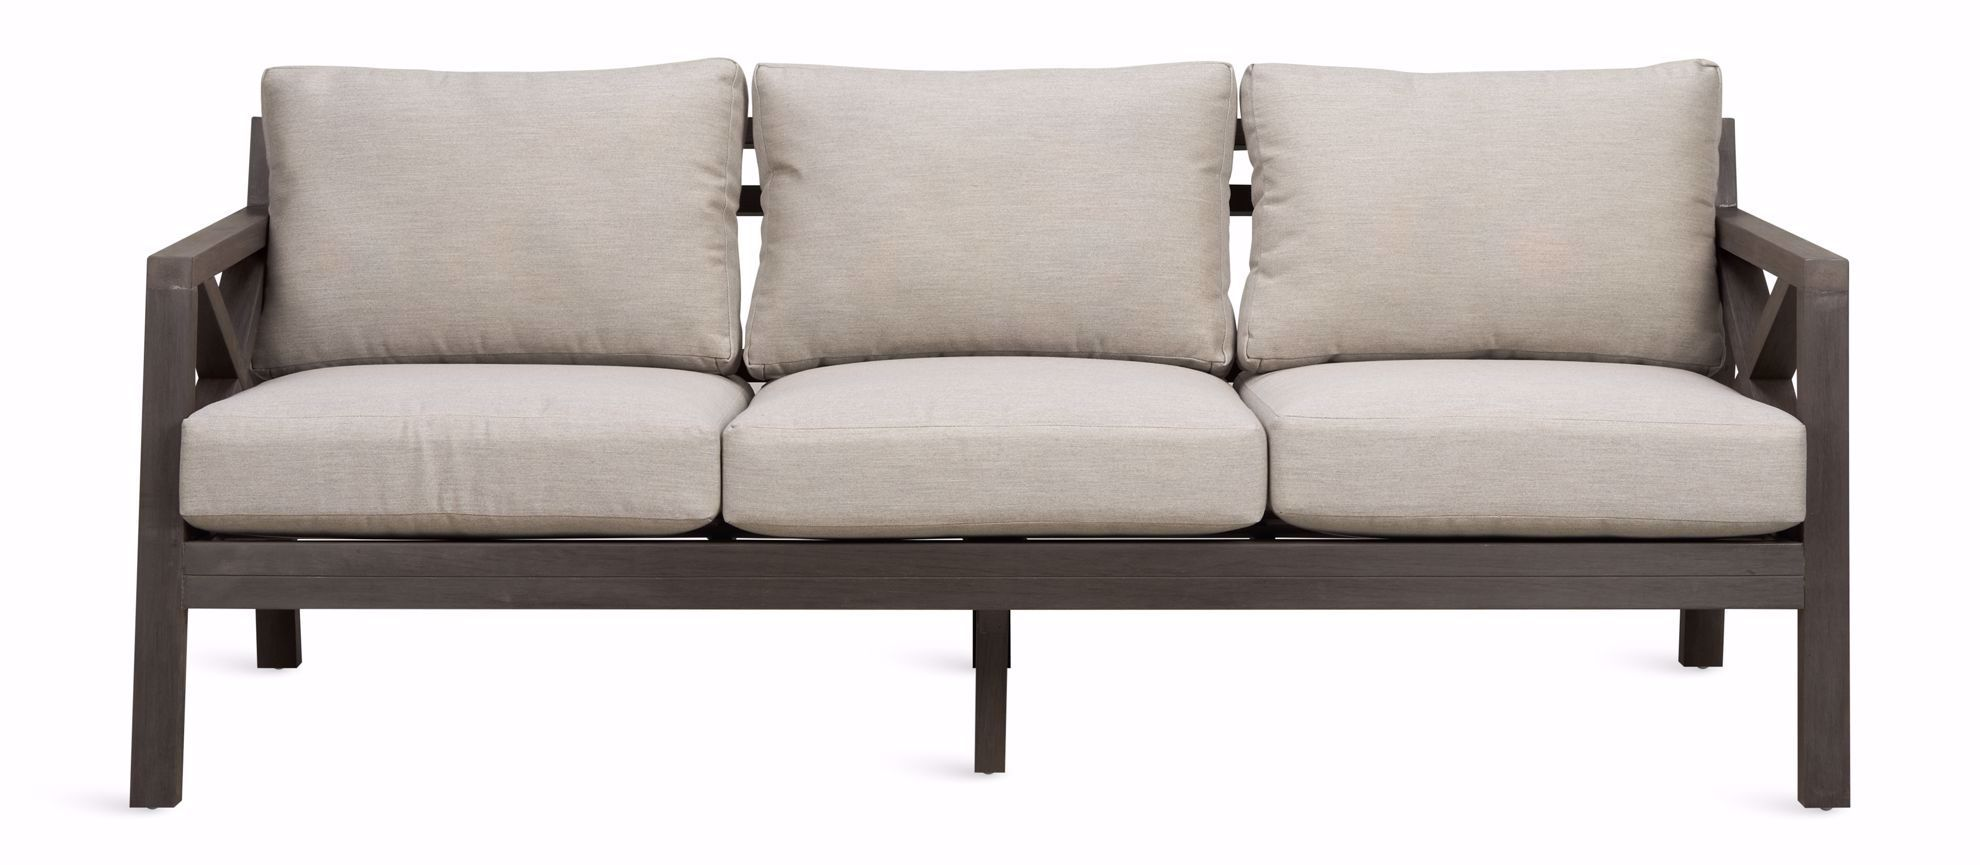 Picture of Kona Patio Sofa